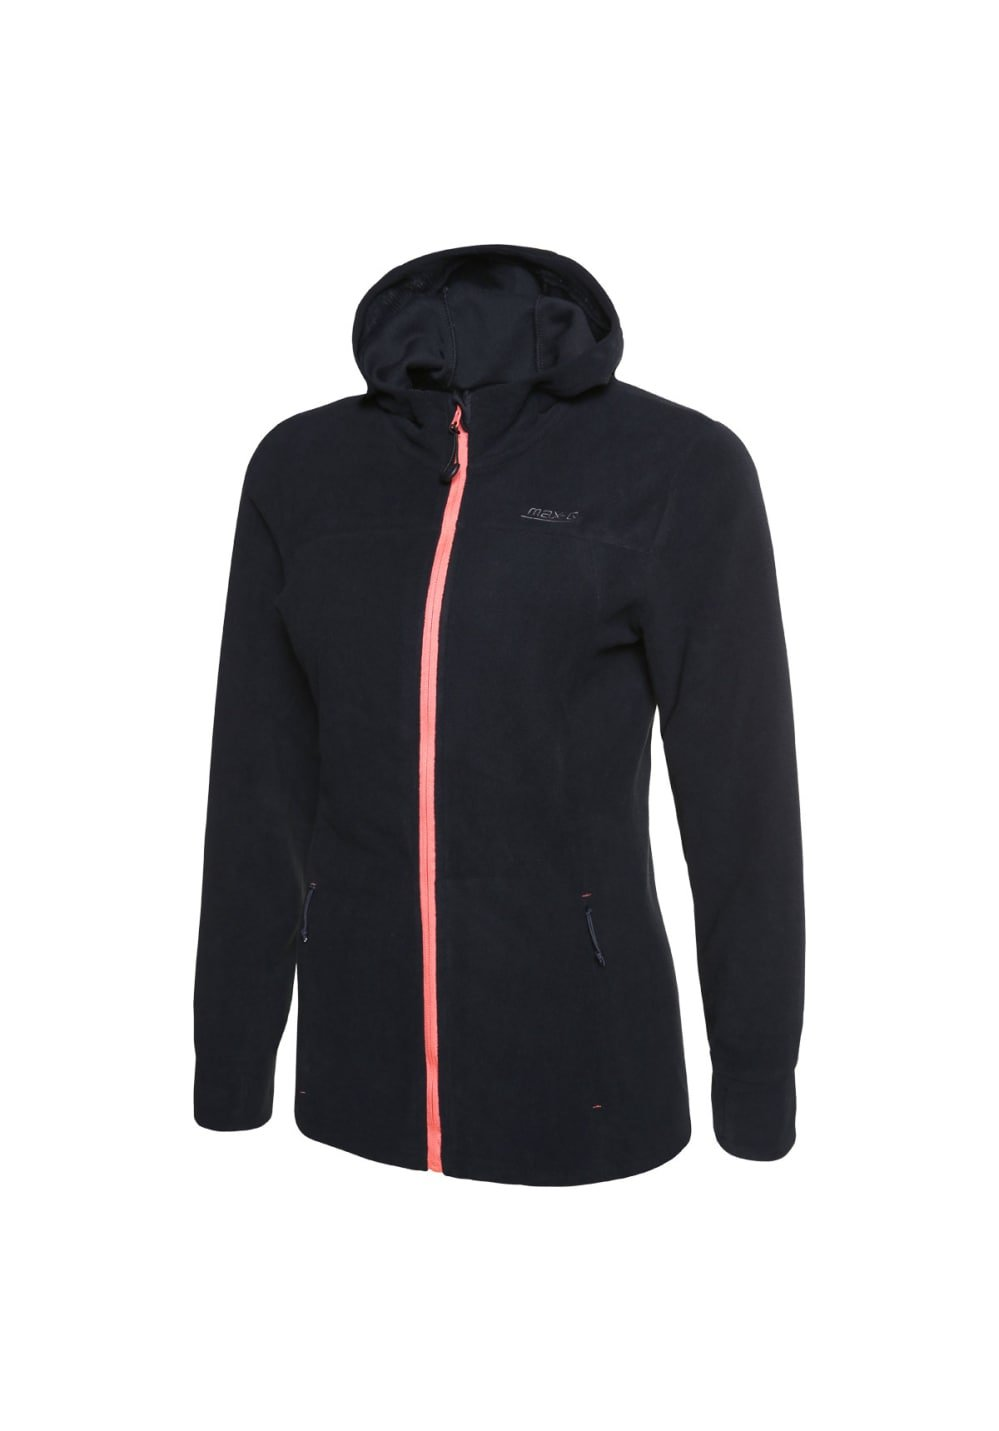 max Power Fleece Jacket Laufjacken für Damen